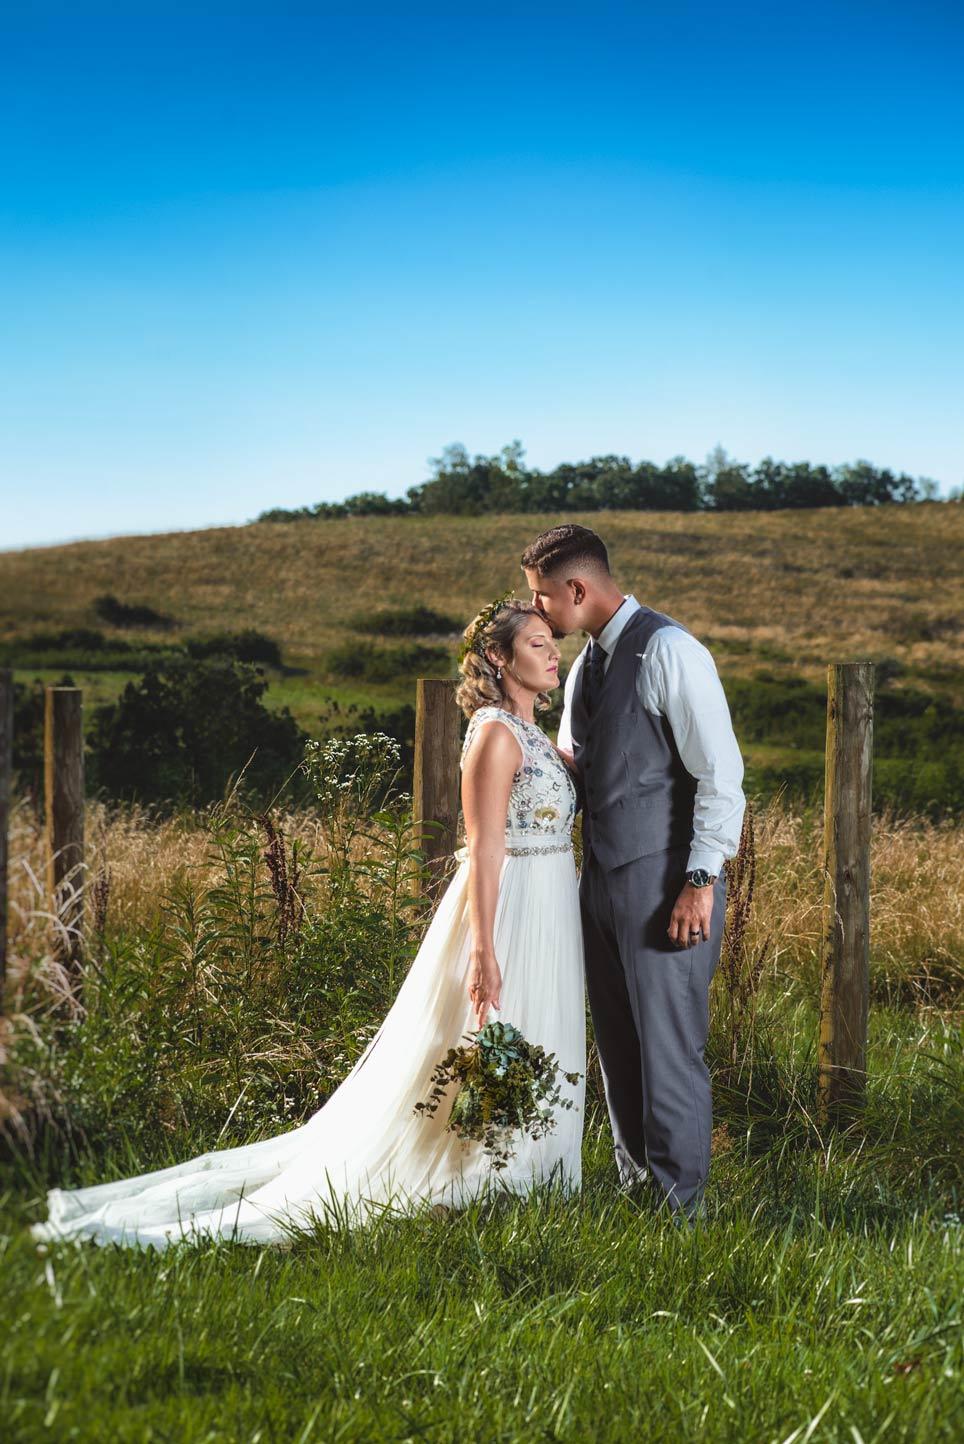 WV-Wedding-Portrait-photography-logan mace photography-fashion-best